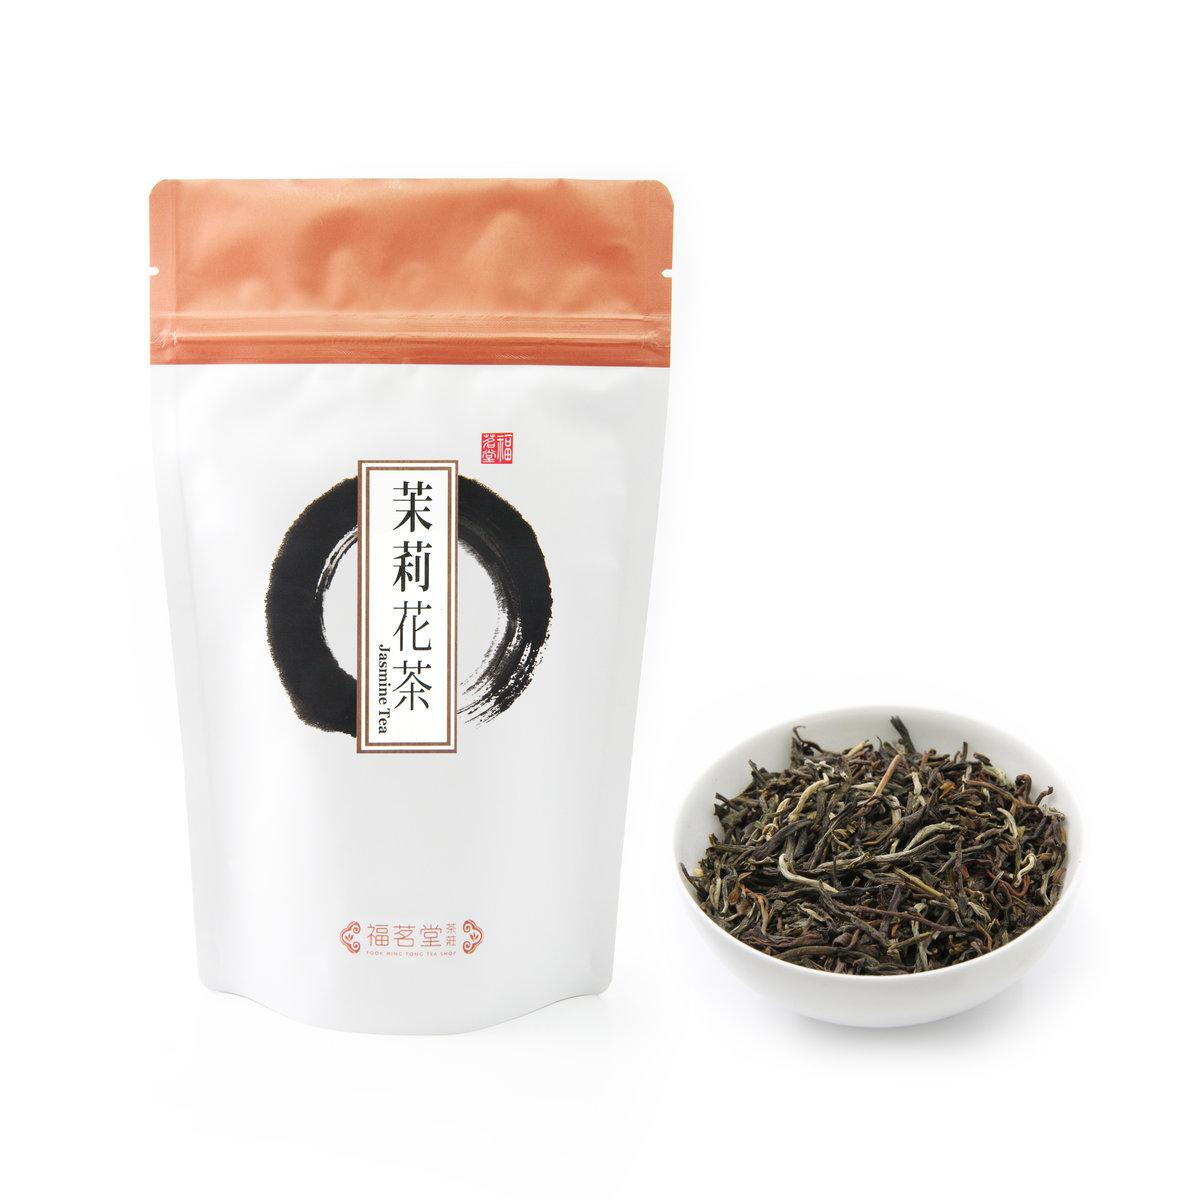 [FMT Series-Tranquility] Jasmine Tea(Packet)